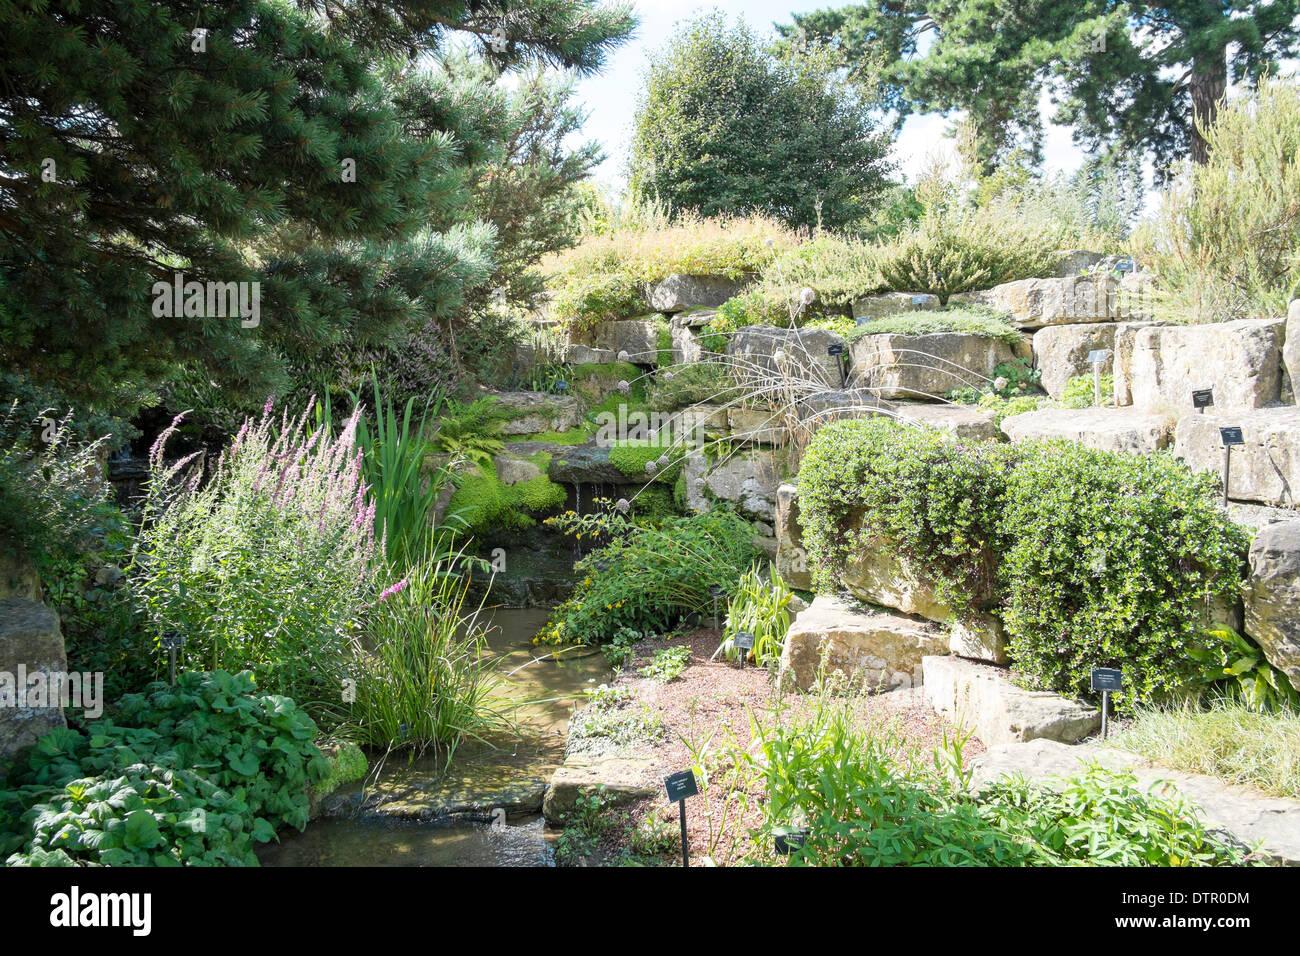 The Rock Garden, Kew Royal Botanic Gardens, England - Stock Image